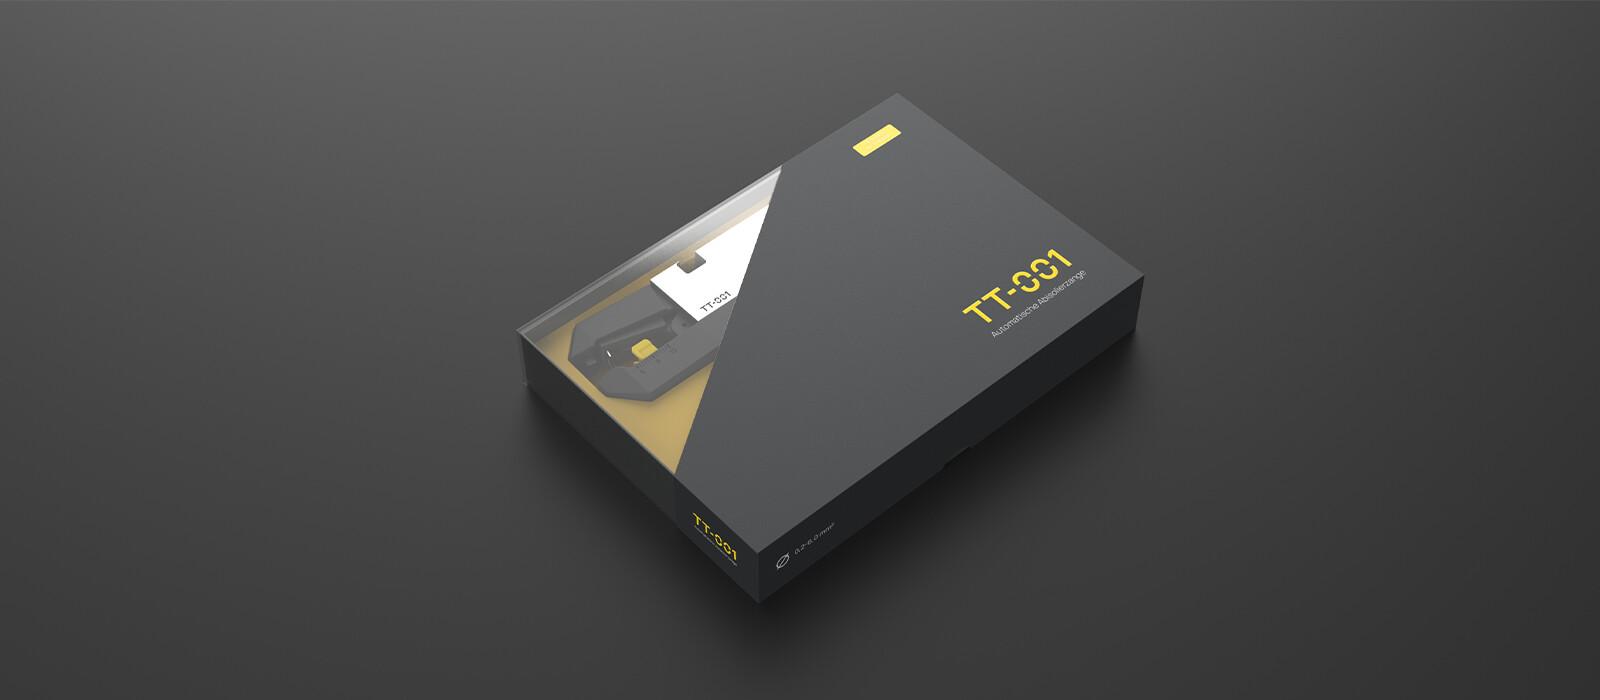 Abisolierzange TT-001